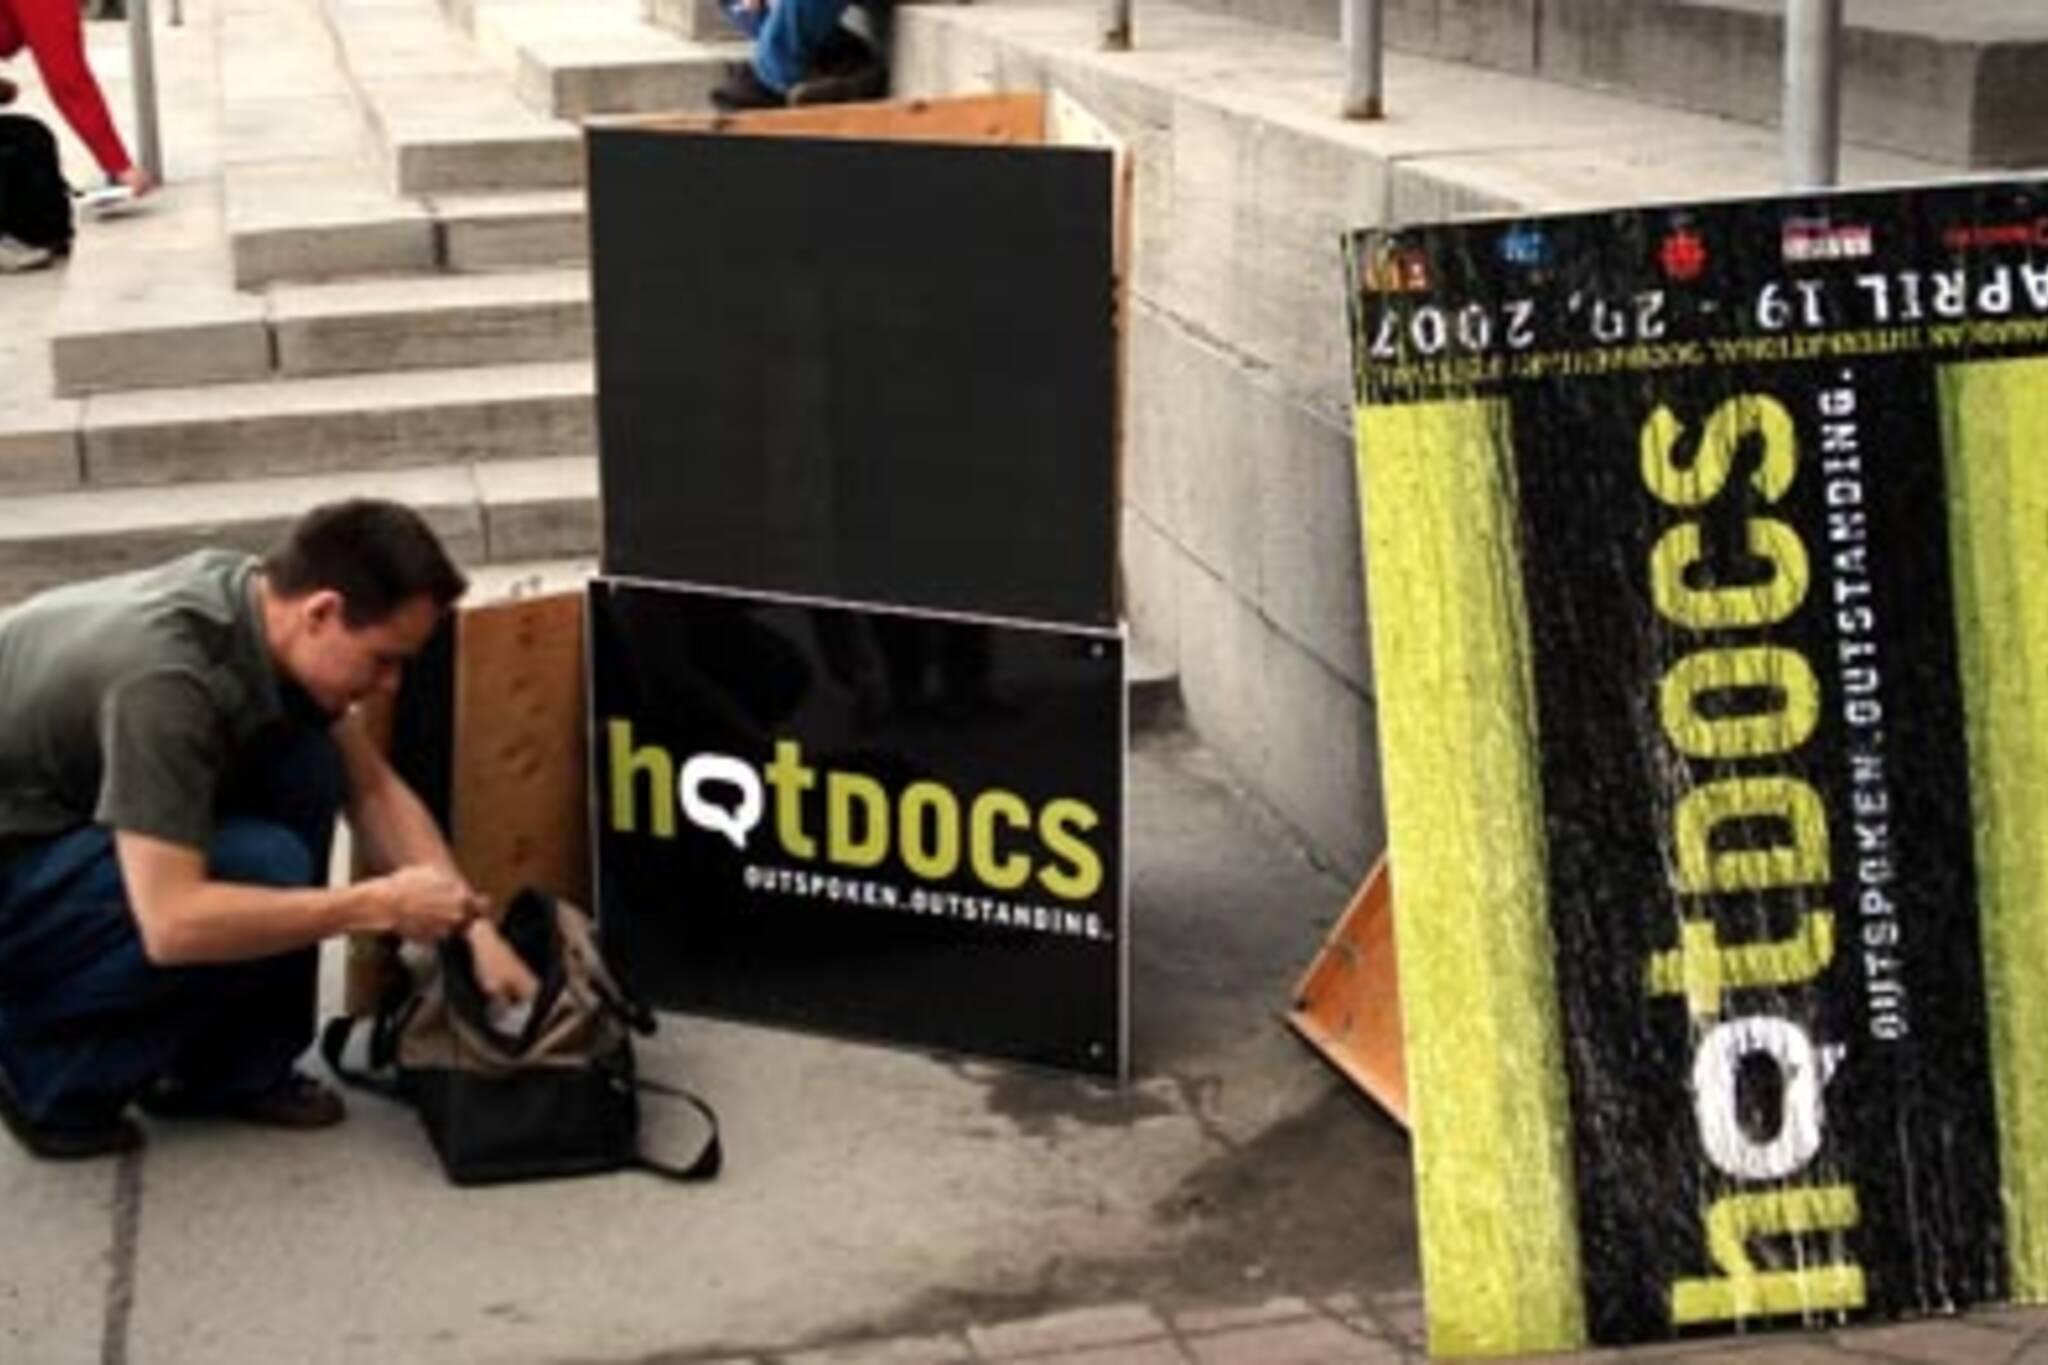 20070430_hotdocs.jpg